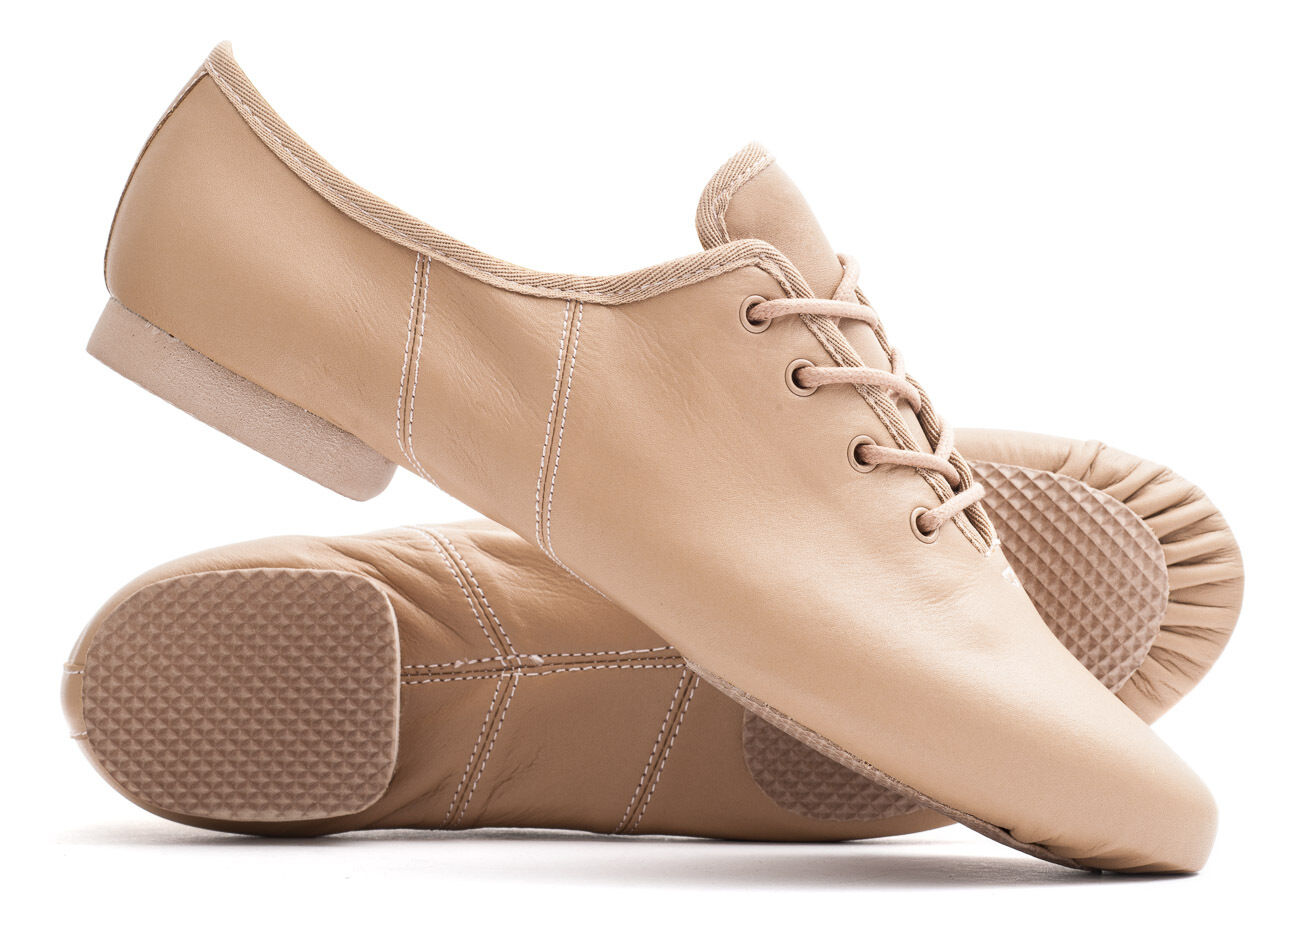 Tan Nude PU Lace Up Rubber Split Sole Jazz Dance Practice Shoes Katz All Sizes